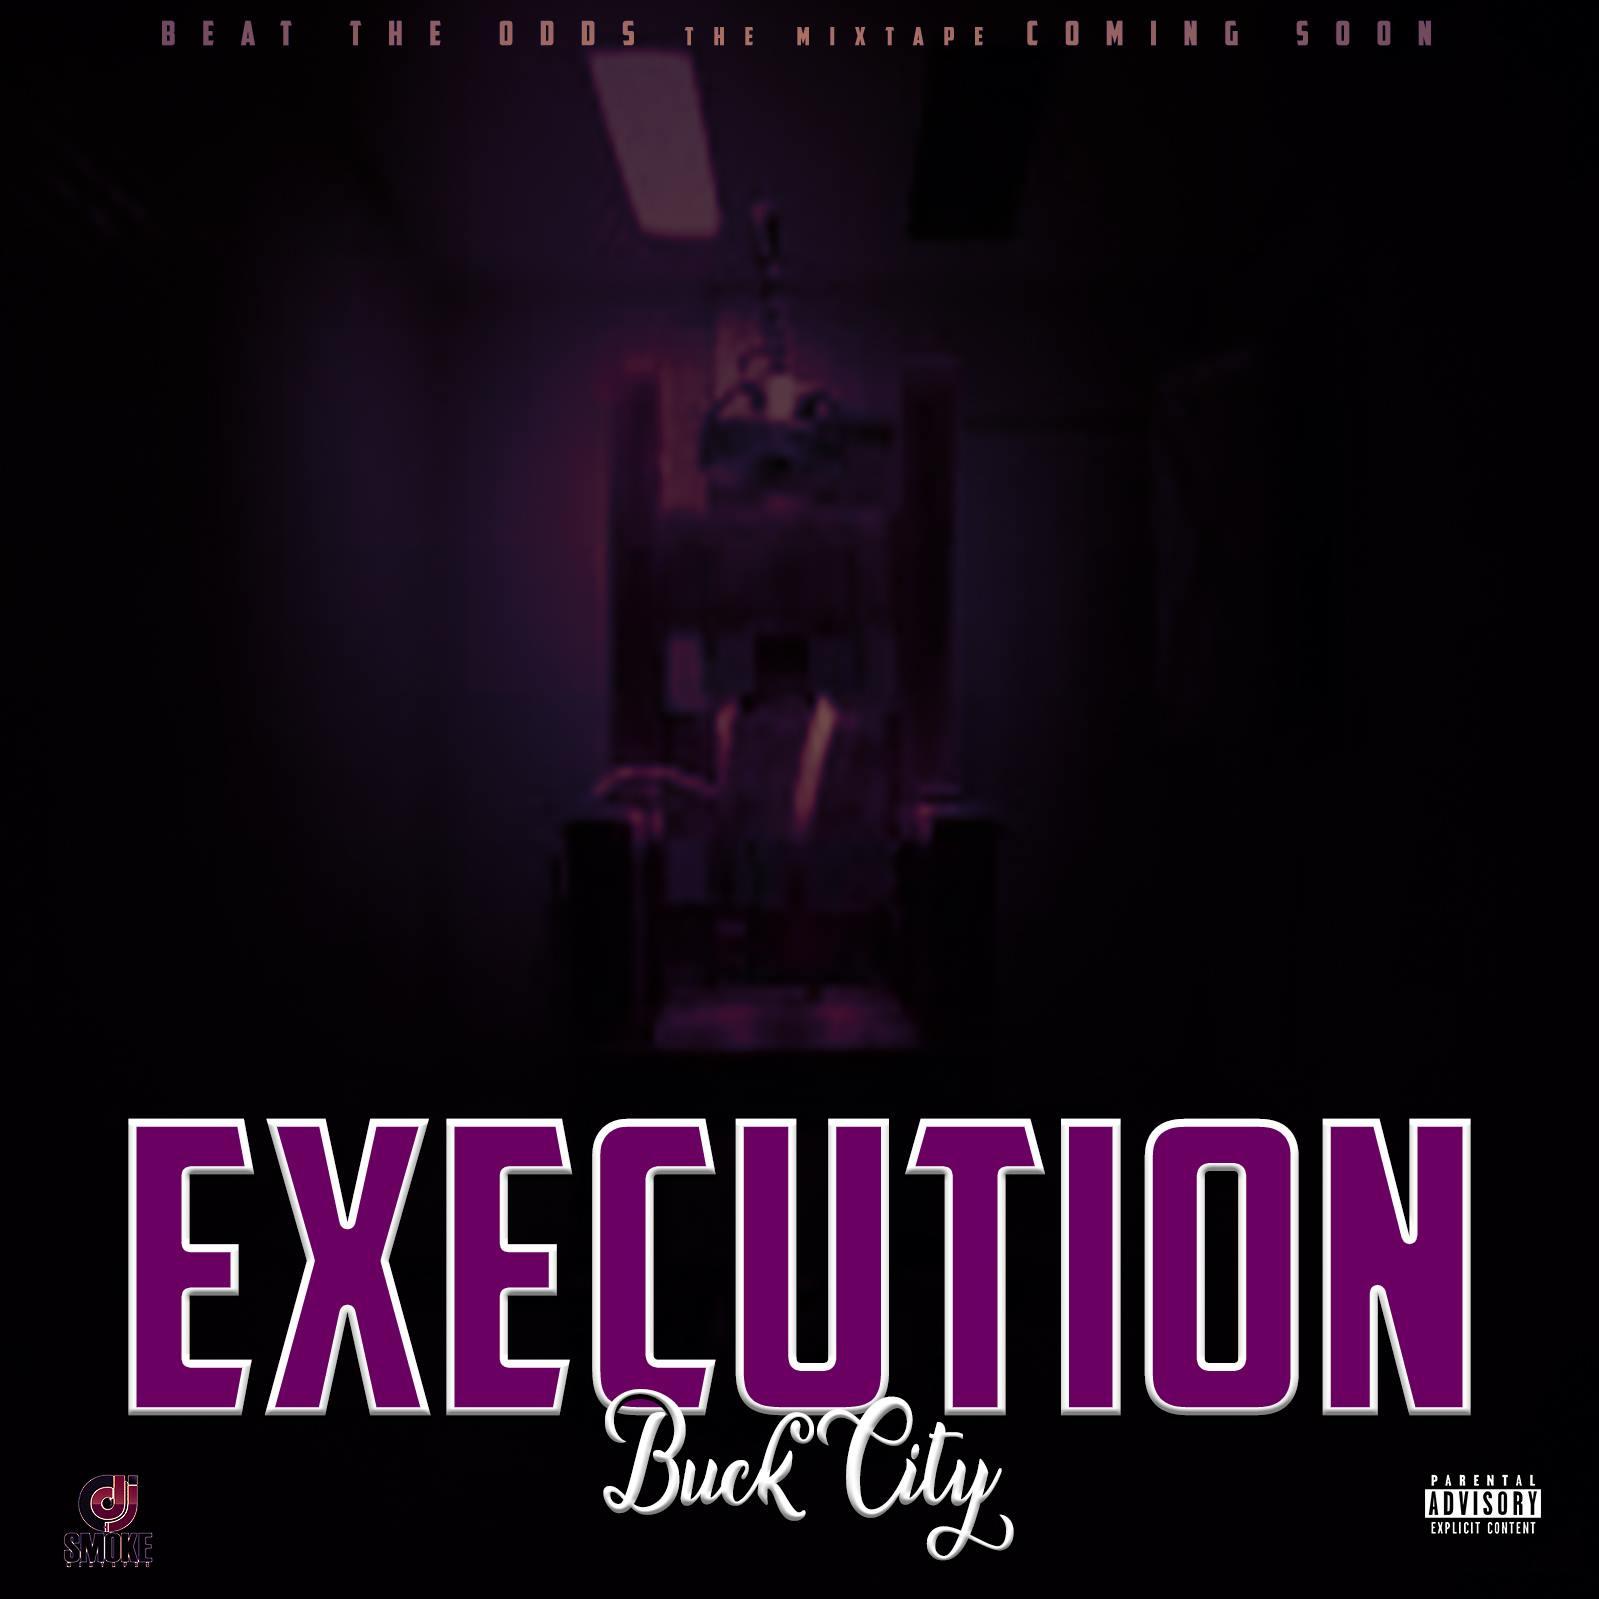 Buck City – Execution